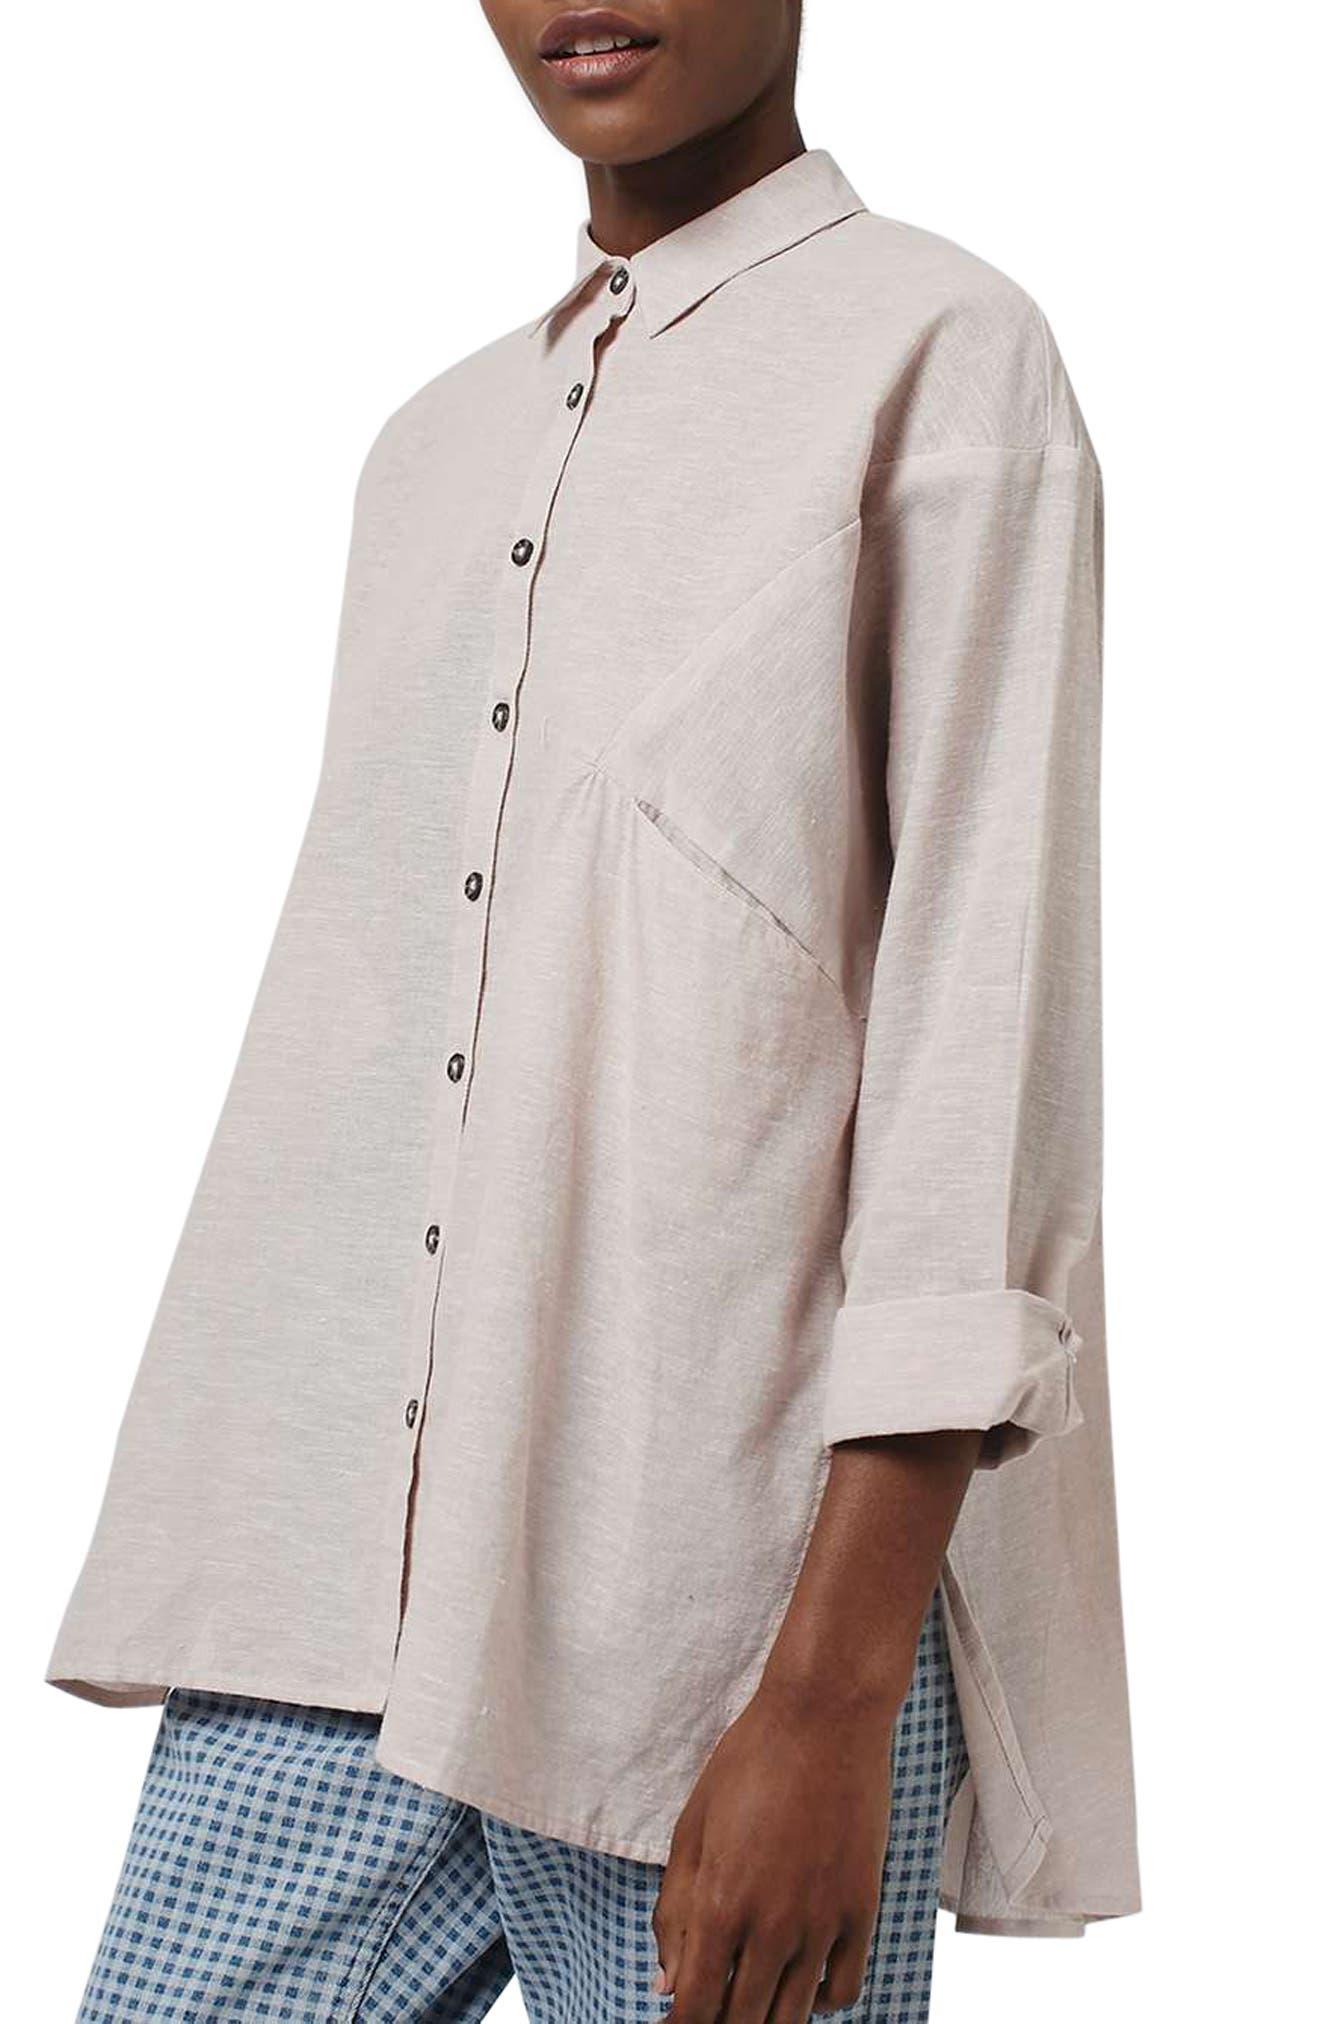 'Ivy' Oversize Chambray Shirt,                             Alternate thumbnail 3, color,                             680